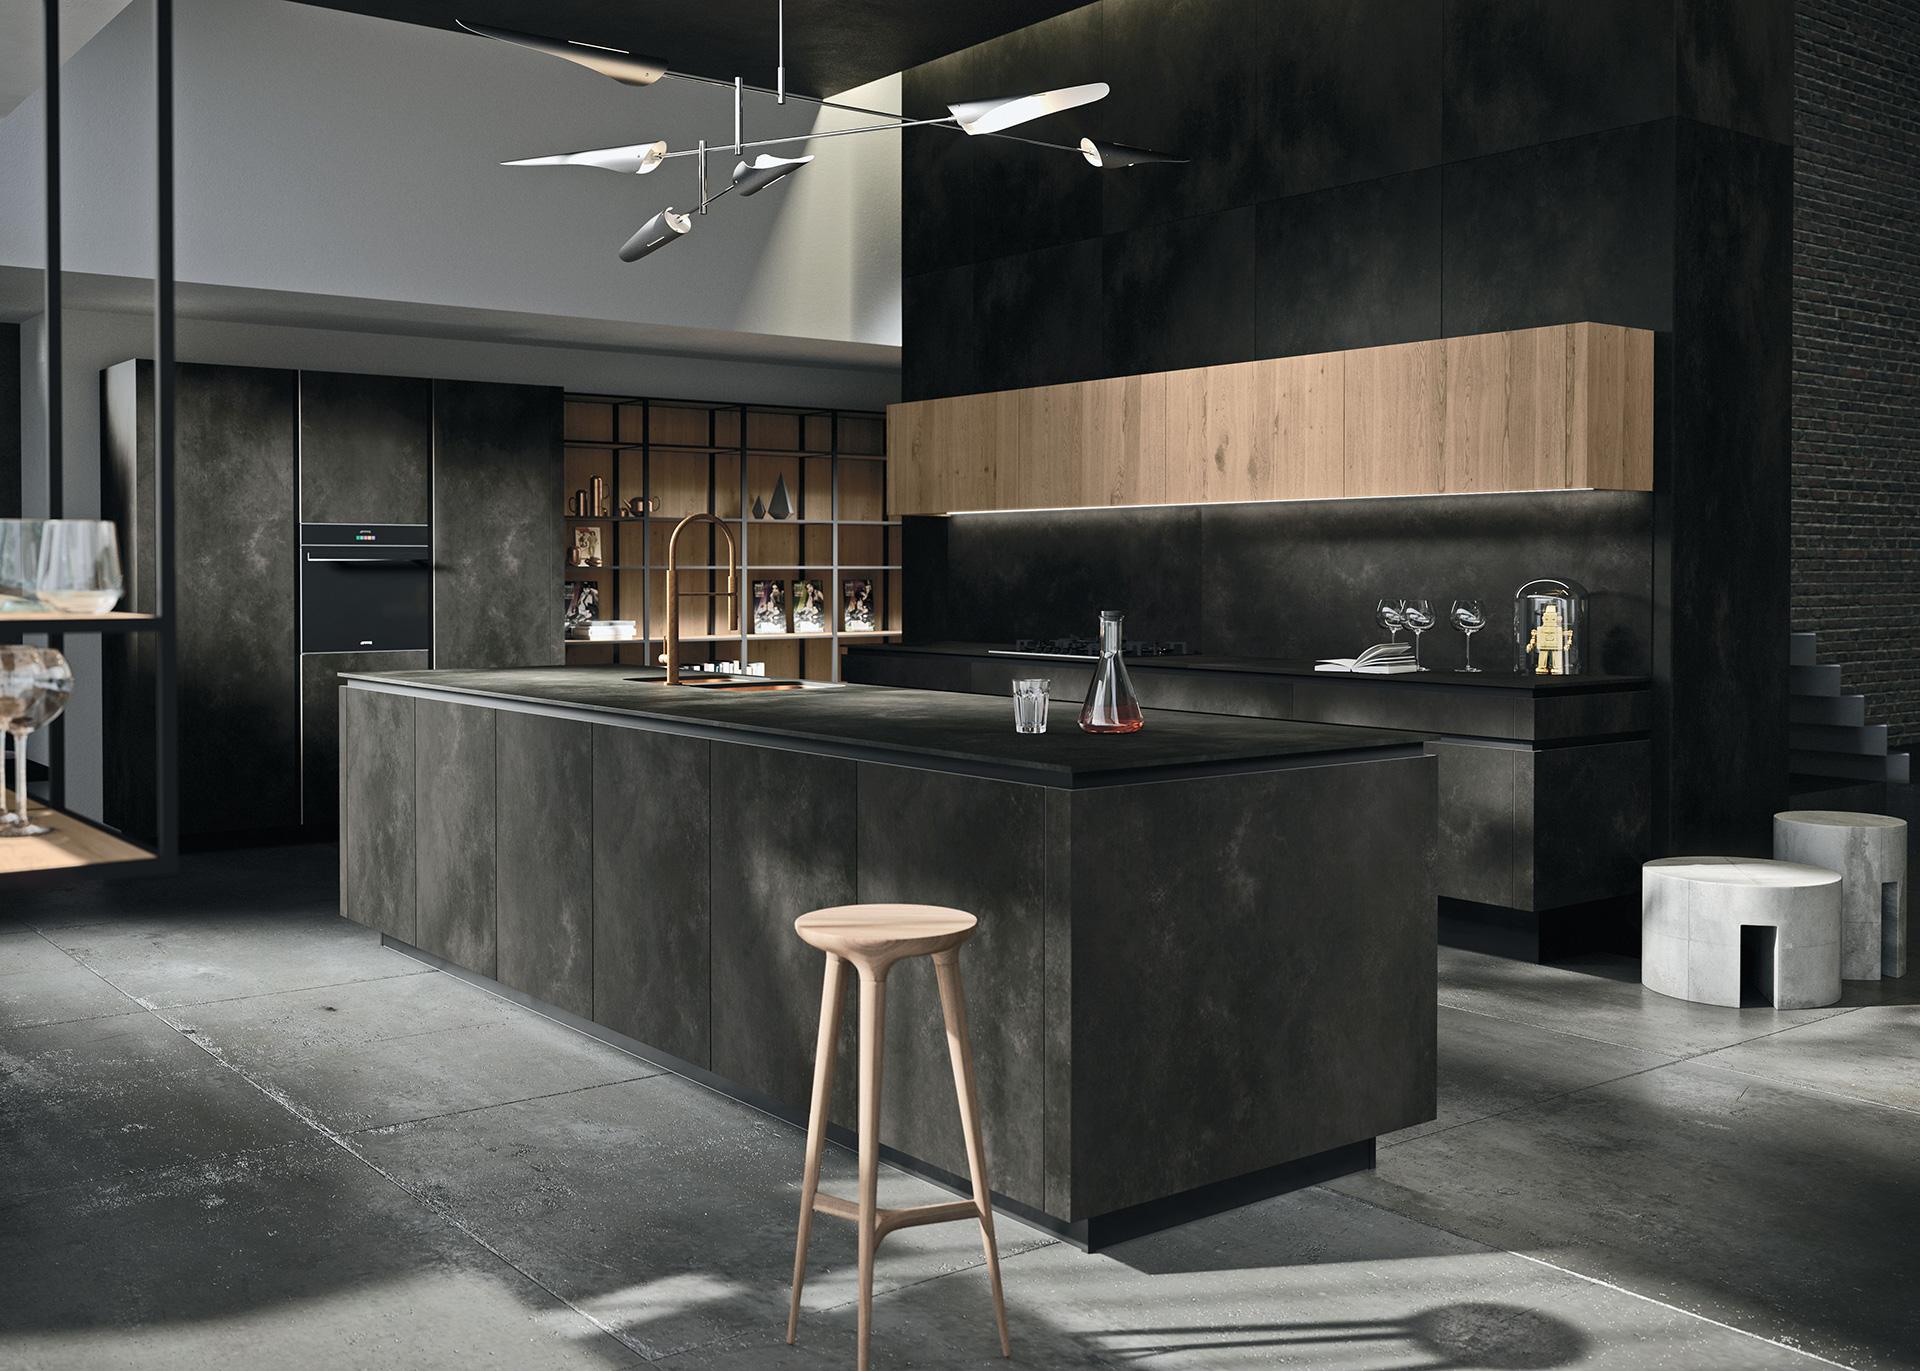 cucina-Way-ceramica-ossido-nero-2